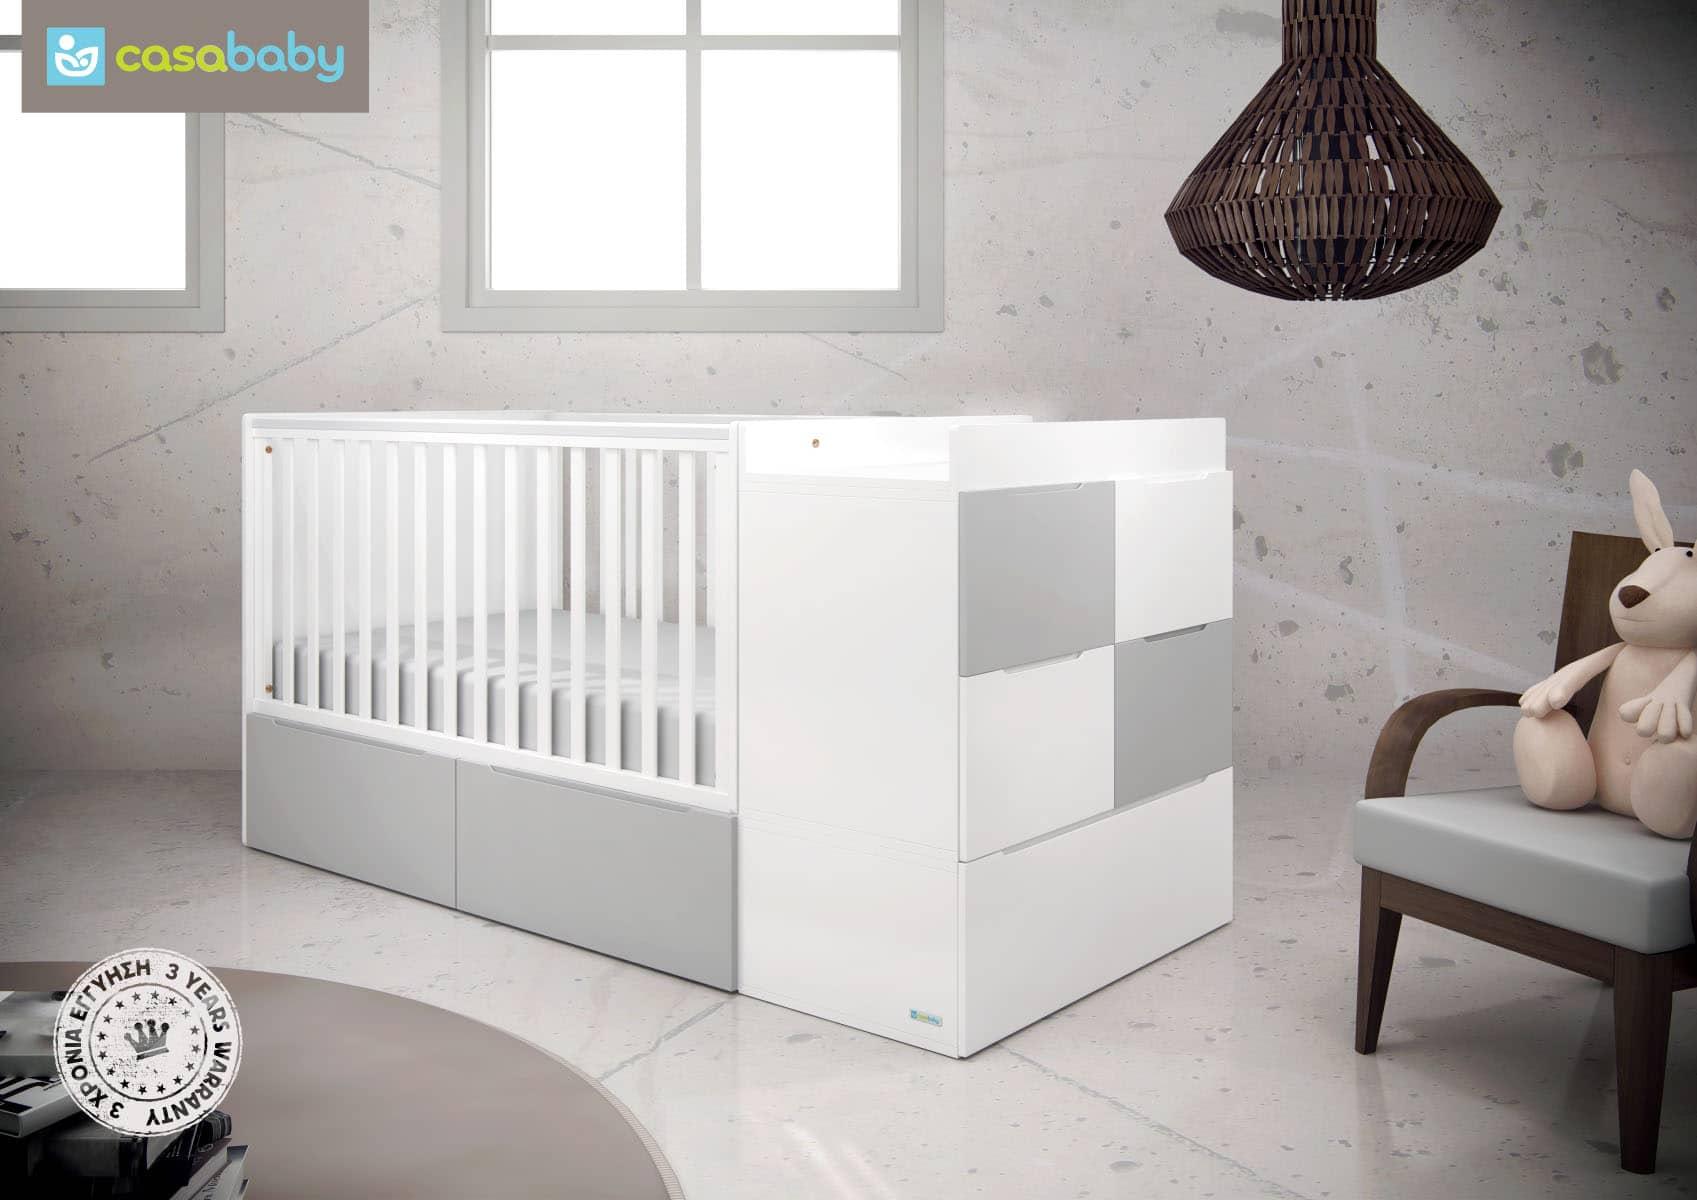 6d72d342730 CasaBaby Πολυμορφικό Κρεβάτι Modular - Bebe Home